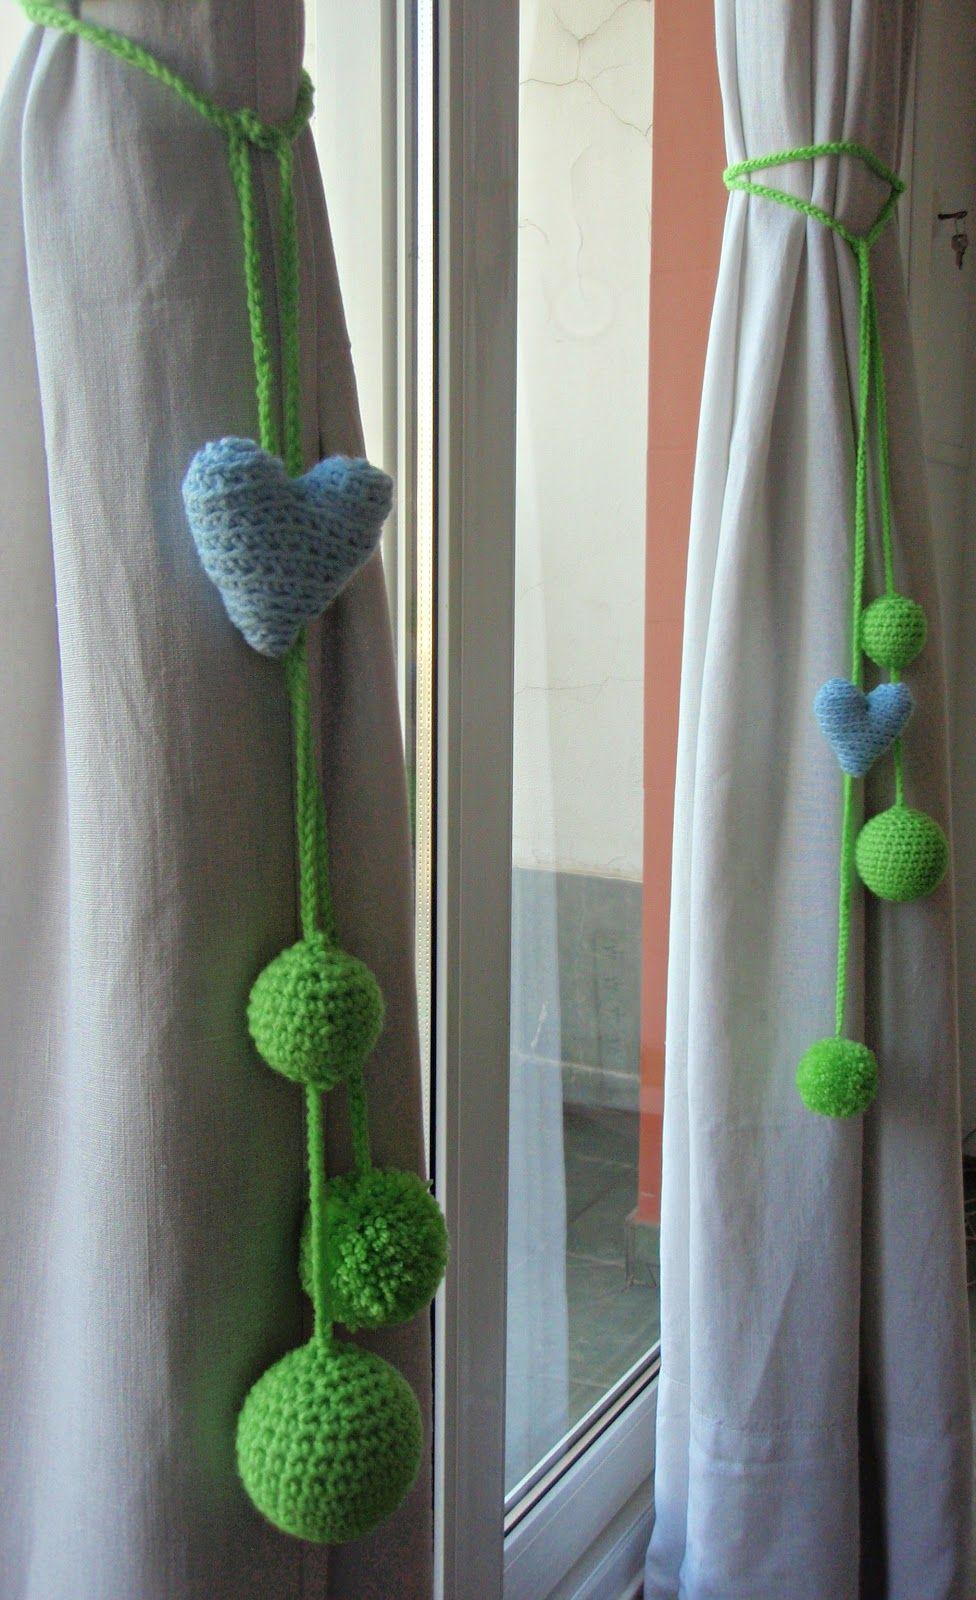 Nuevas cortinas y sujeta cortinas costura pinterest - Alzapanos para cortinas ...